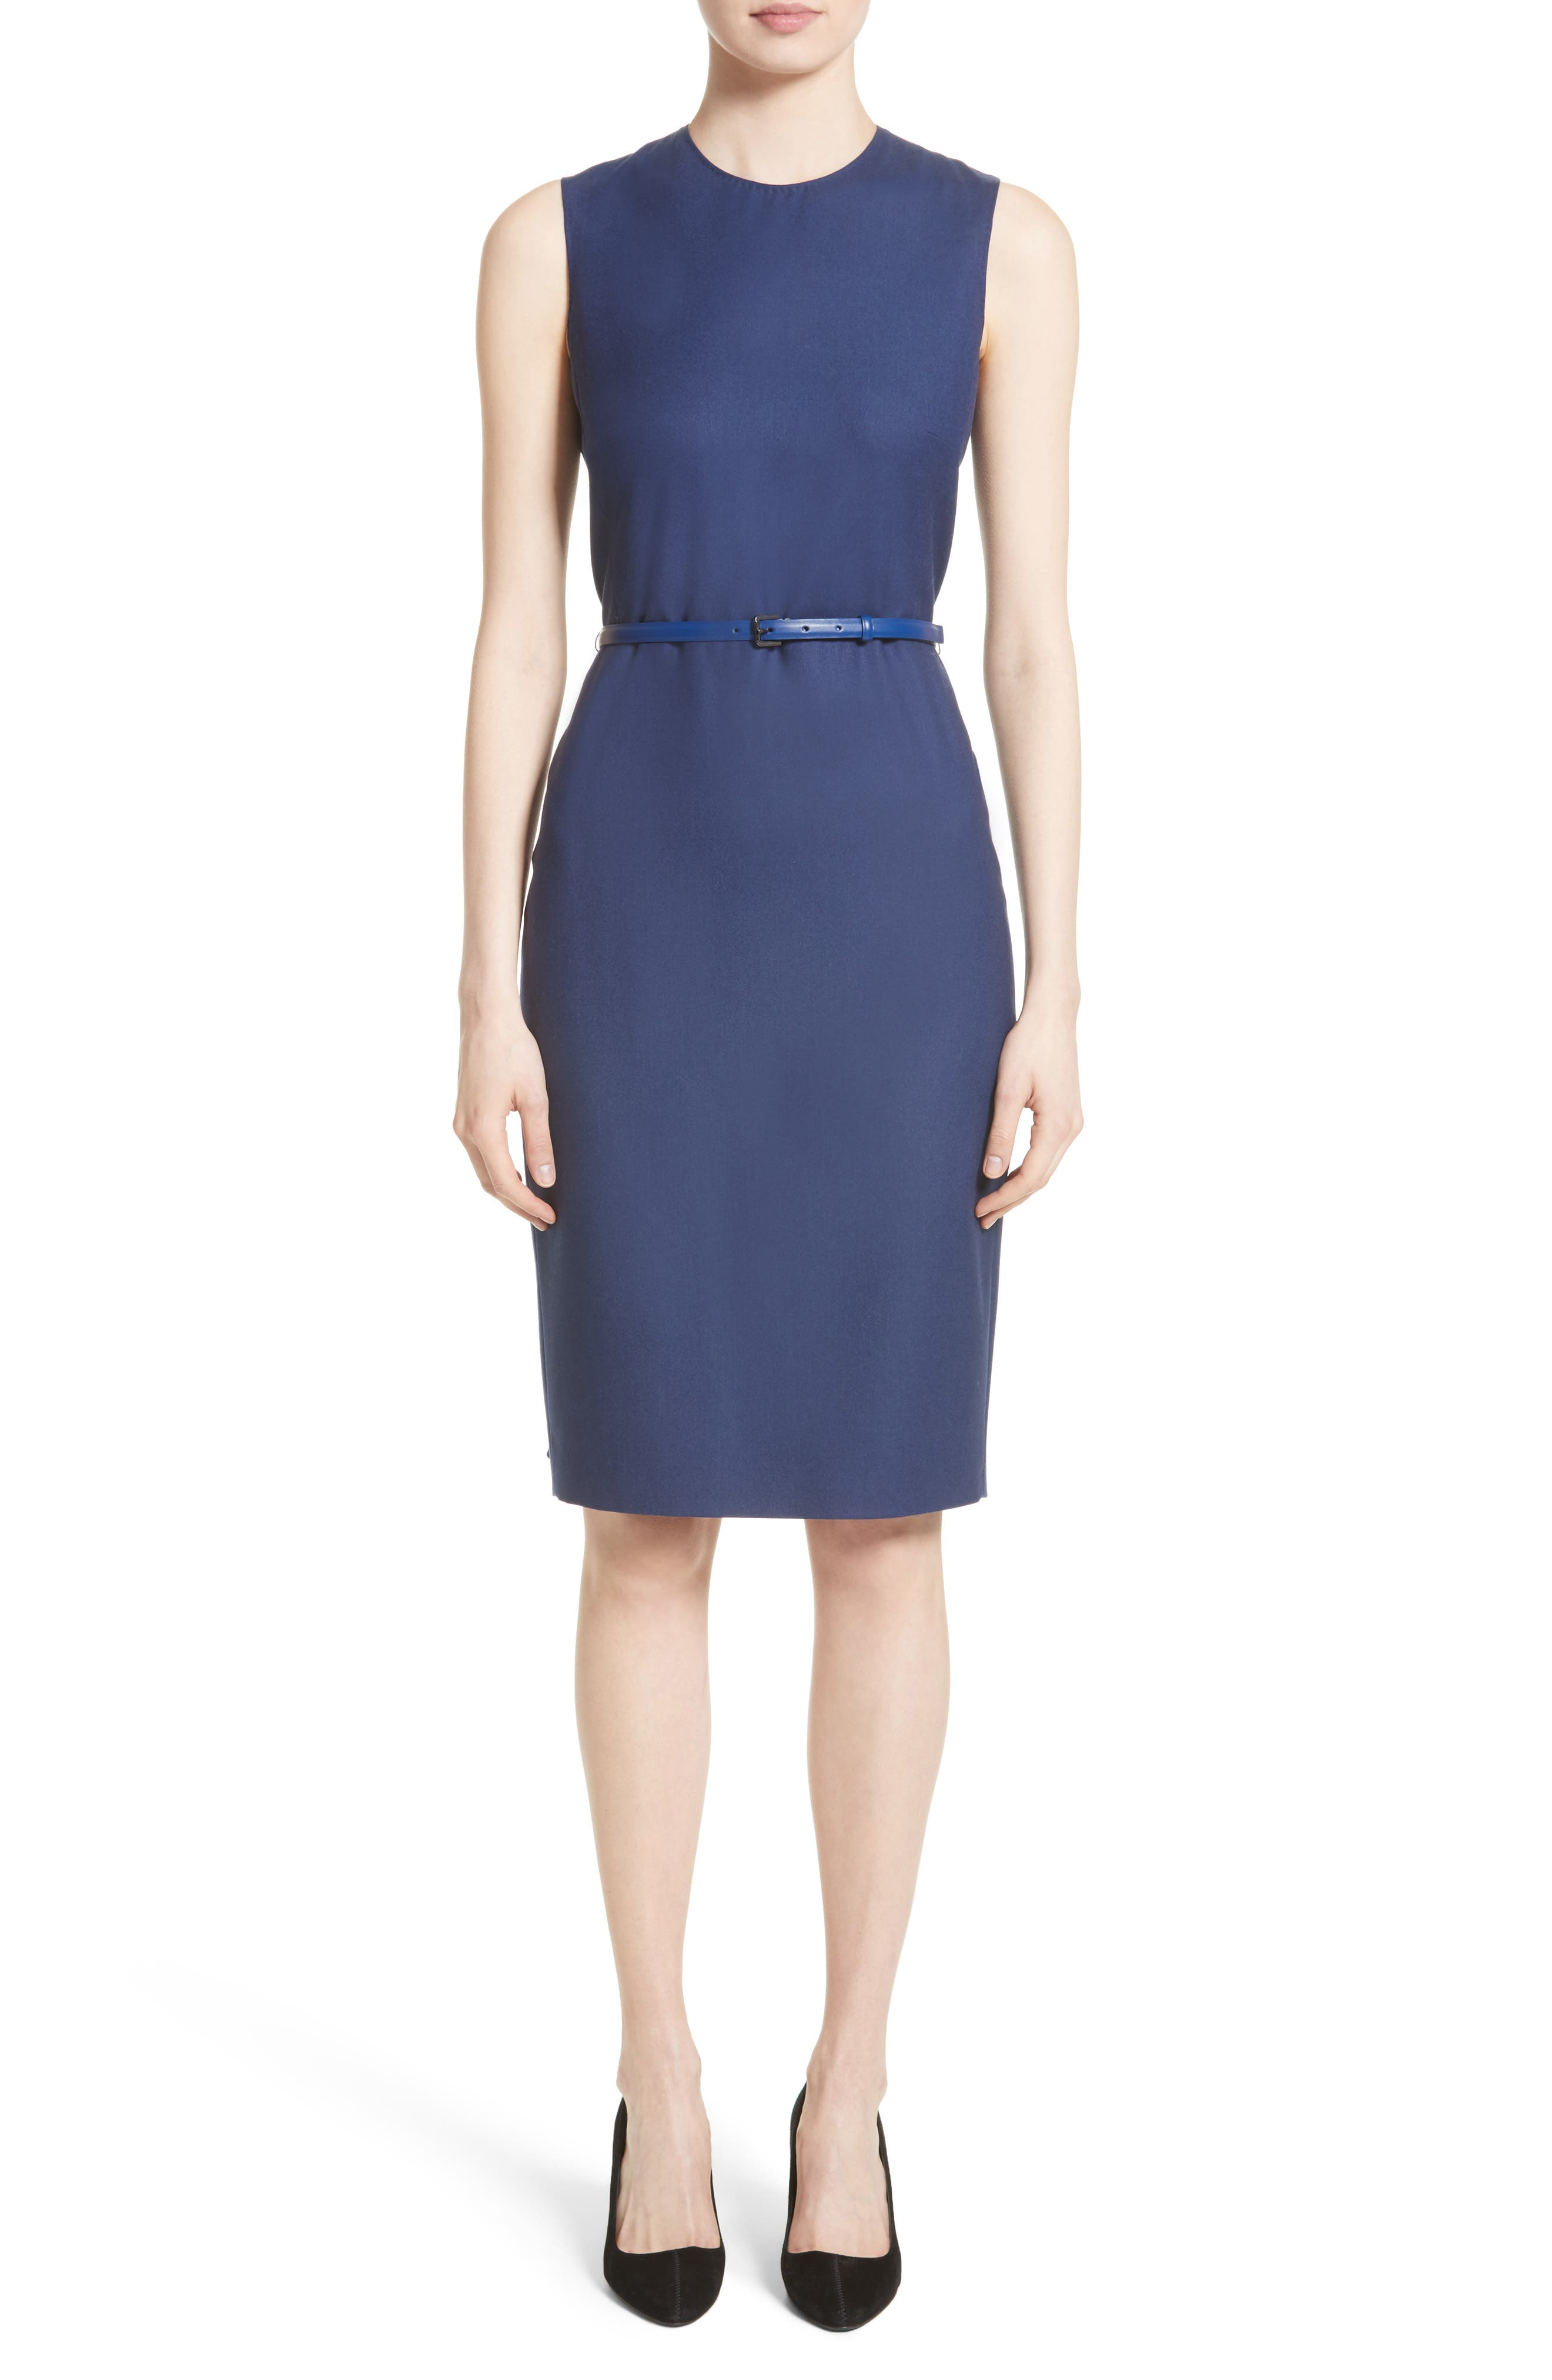 Alternate Image 1 Selected - Max Mara Glassa Sheath Dress